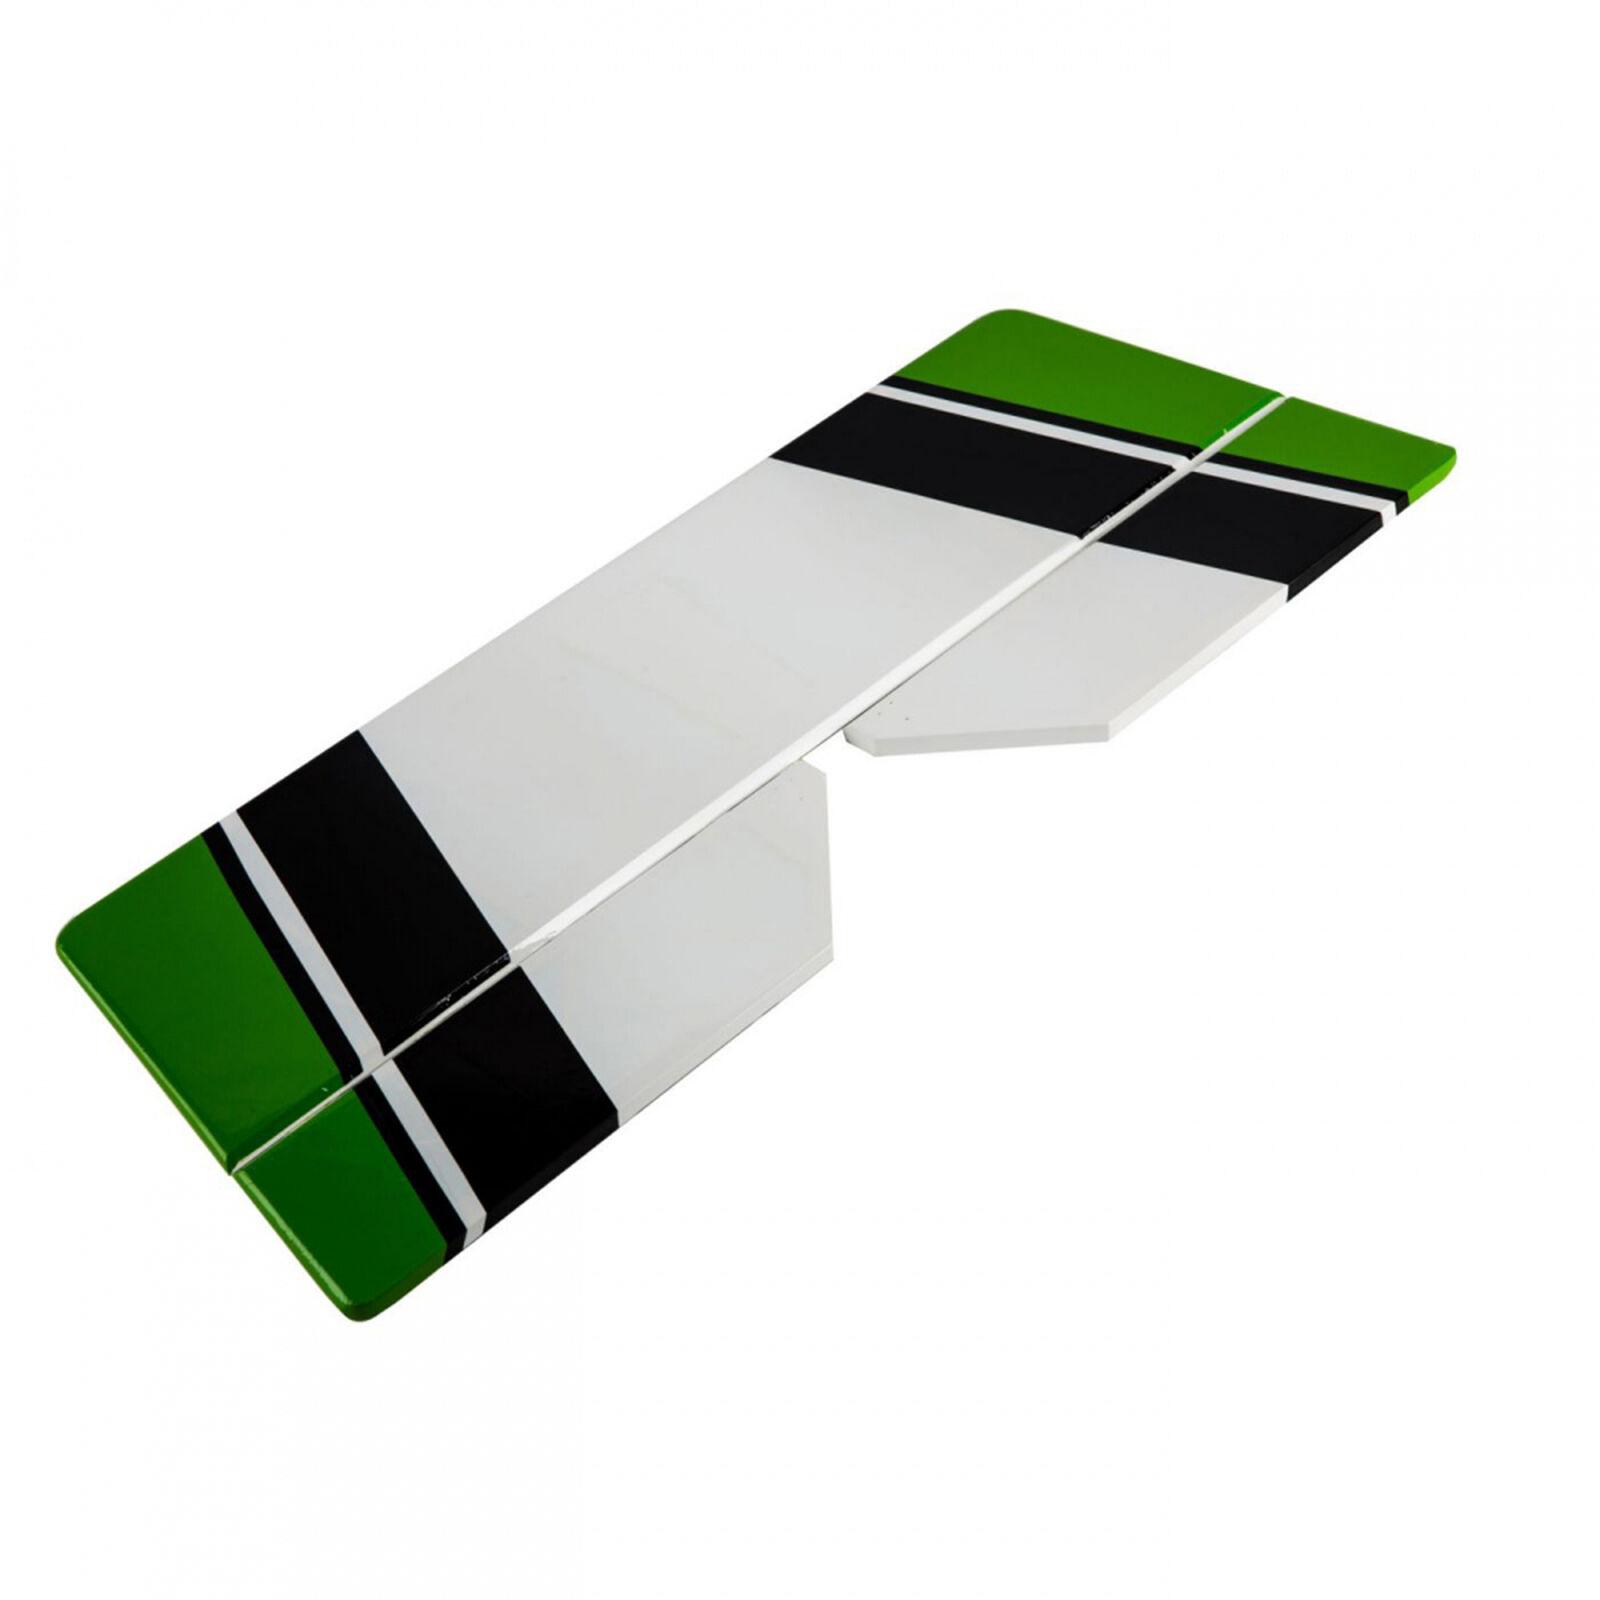 Ultra Stick 30cc - Stabilisateur horizontal avec profondeur